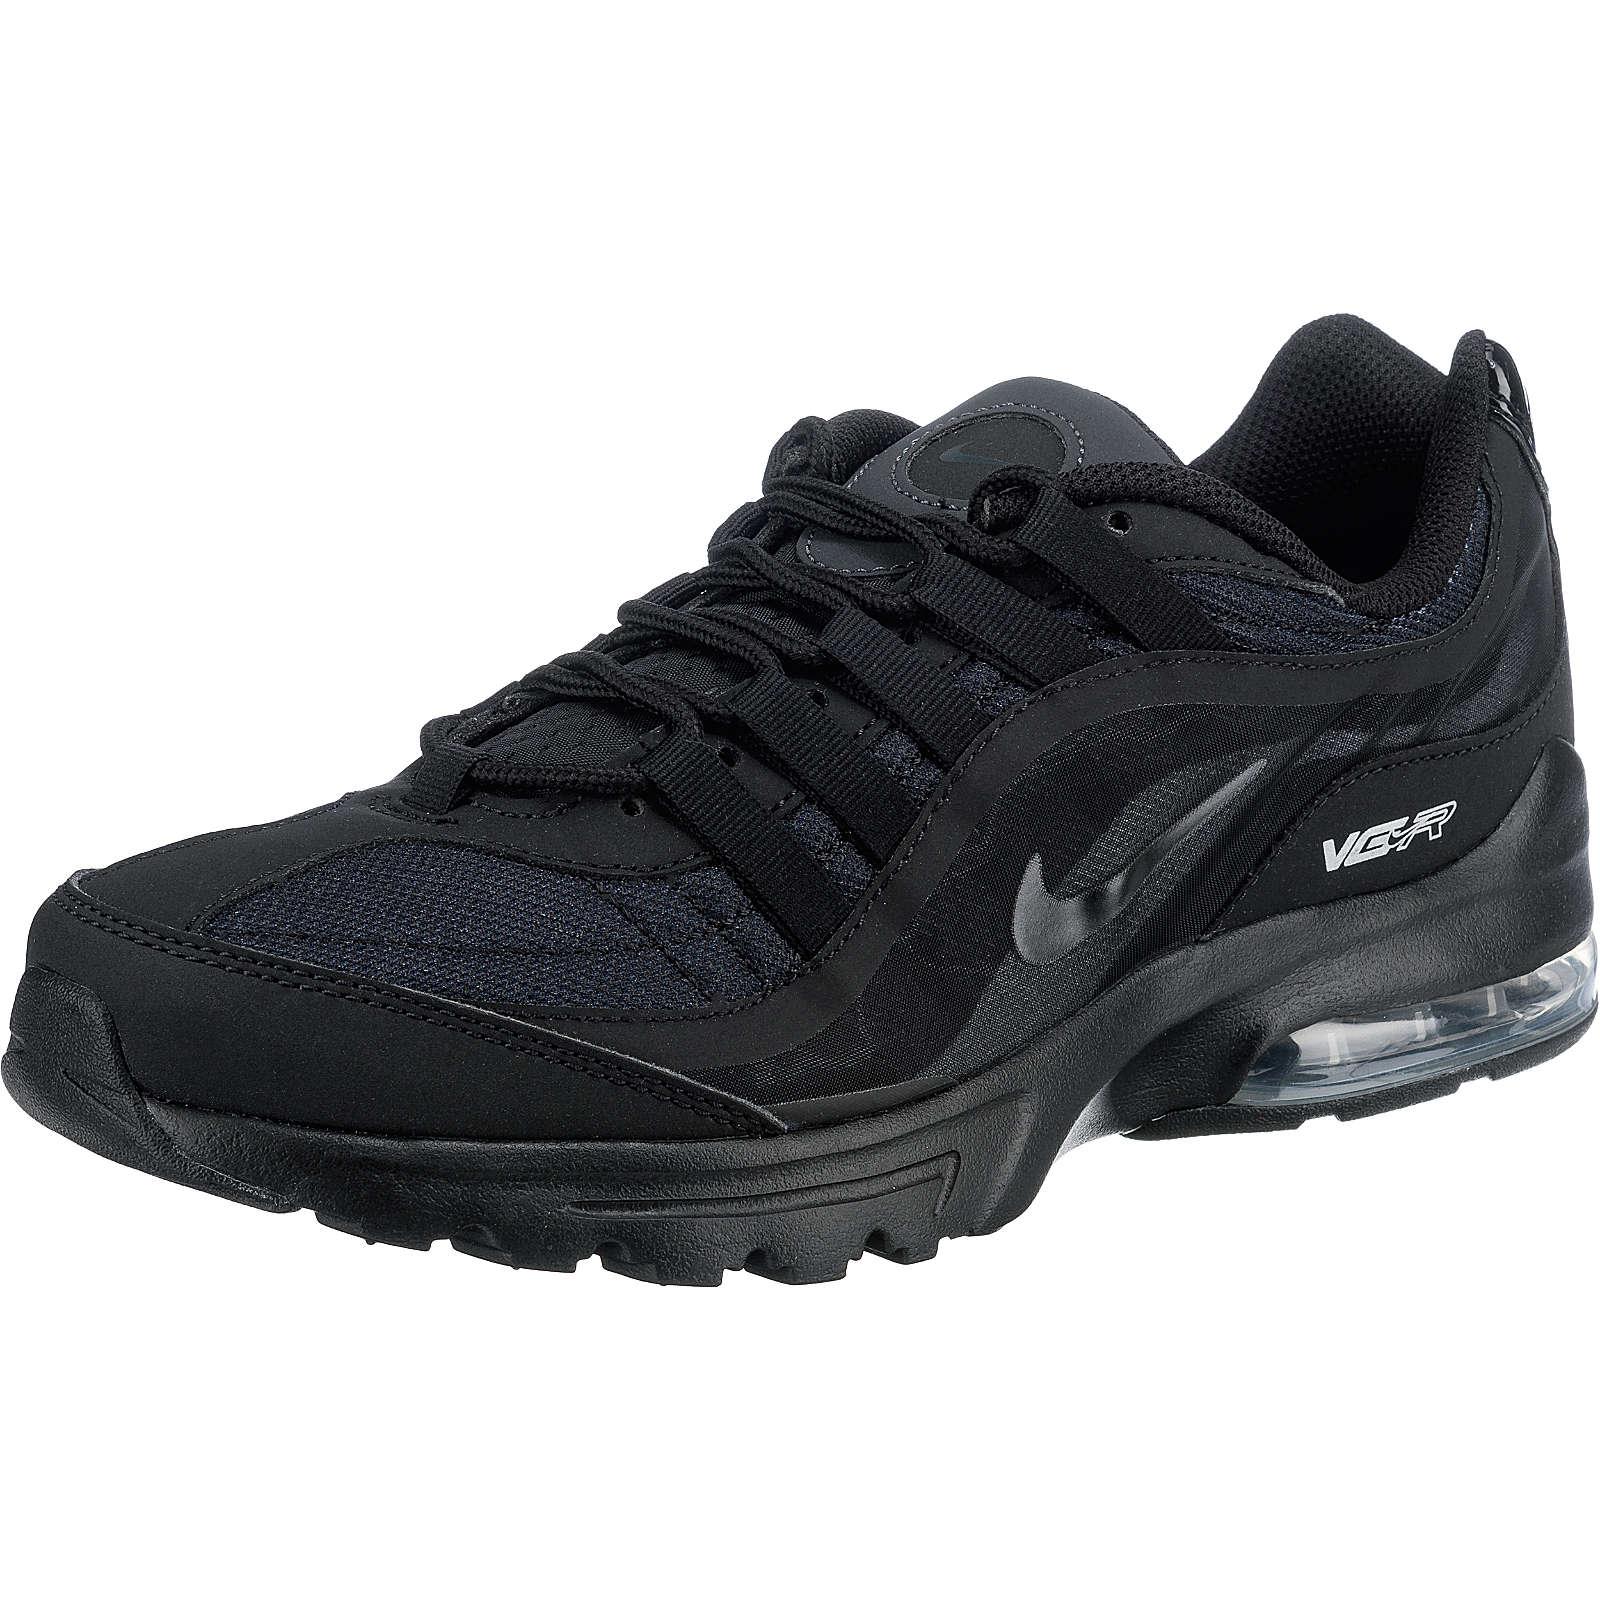 Nike Sportswear Air Max Vg-r Sneakers Low anthrazit/schwarz Herren Gr. 42